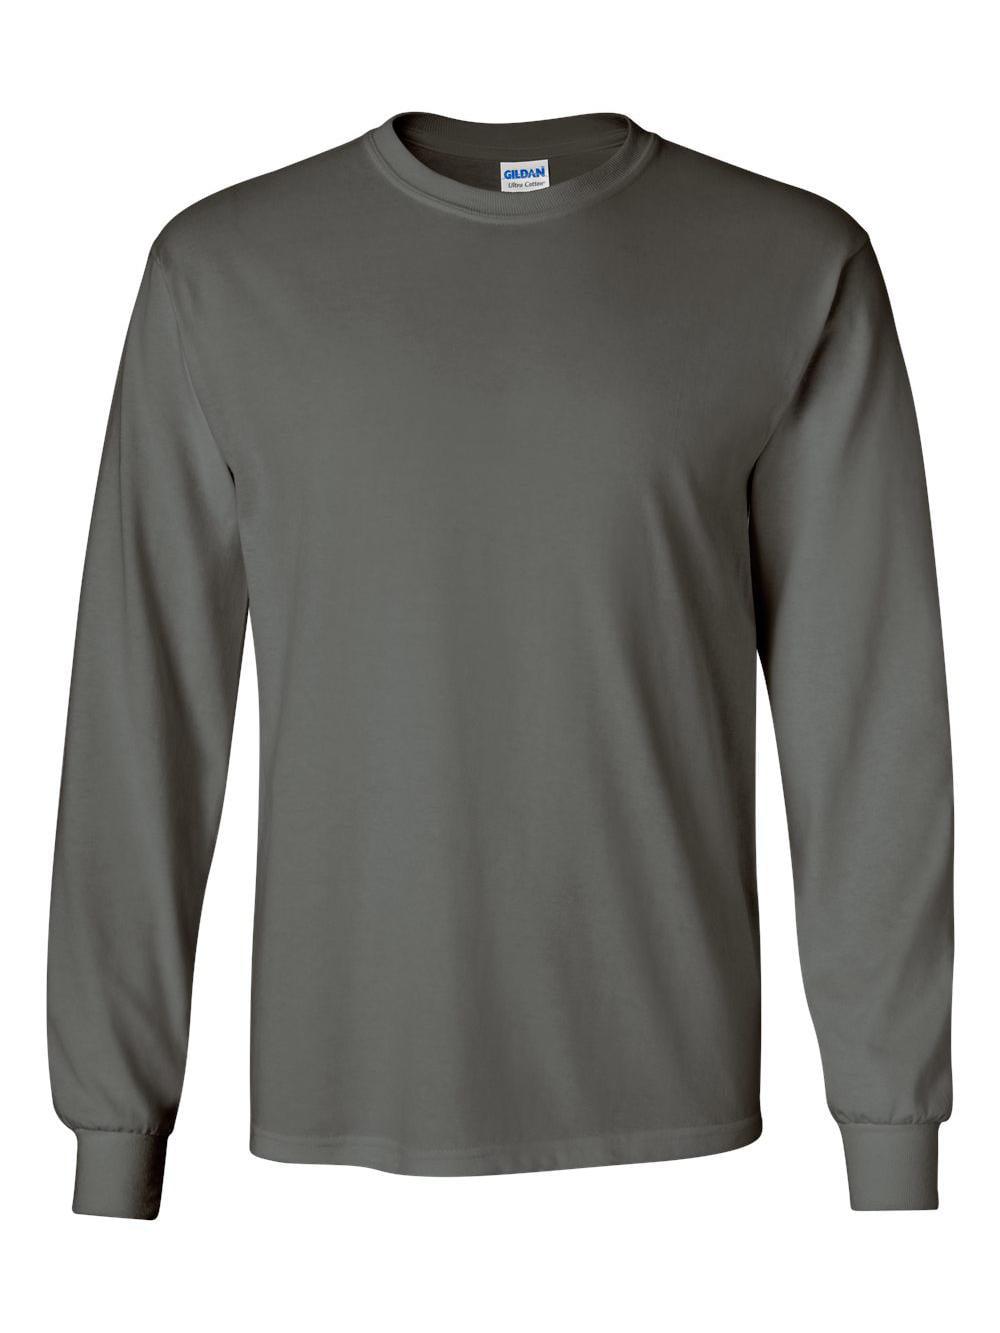 Gildan - Gildan - Ultra Cotton Long Sleeve T-Shirt